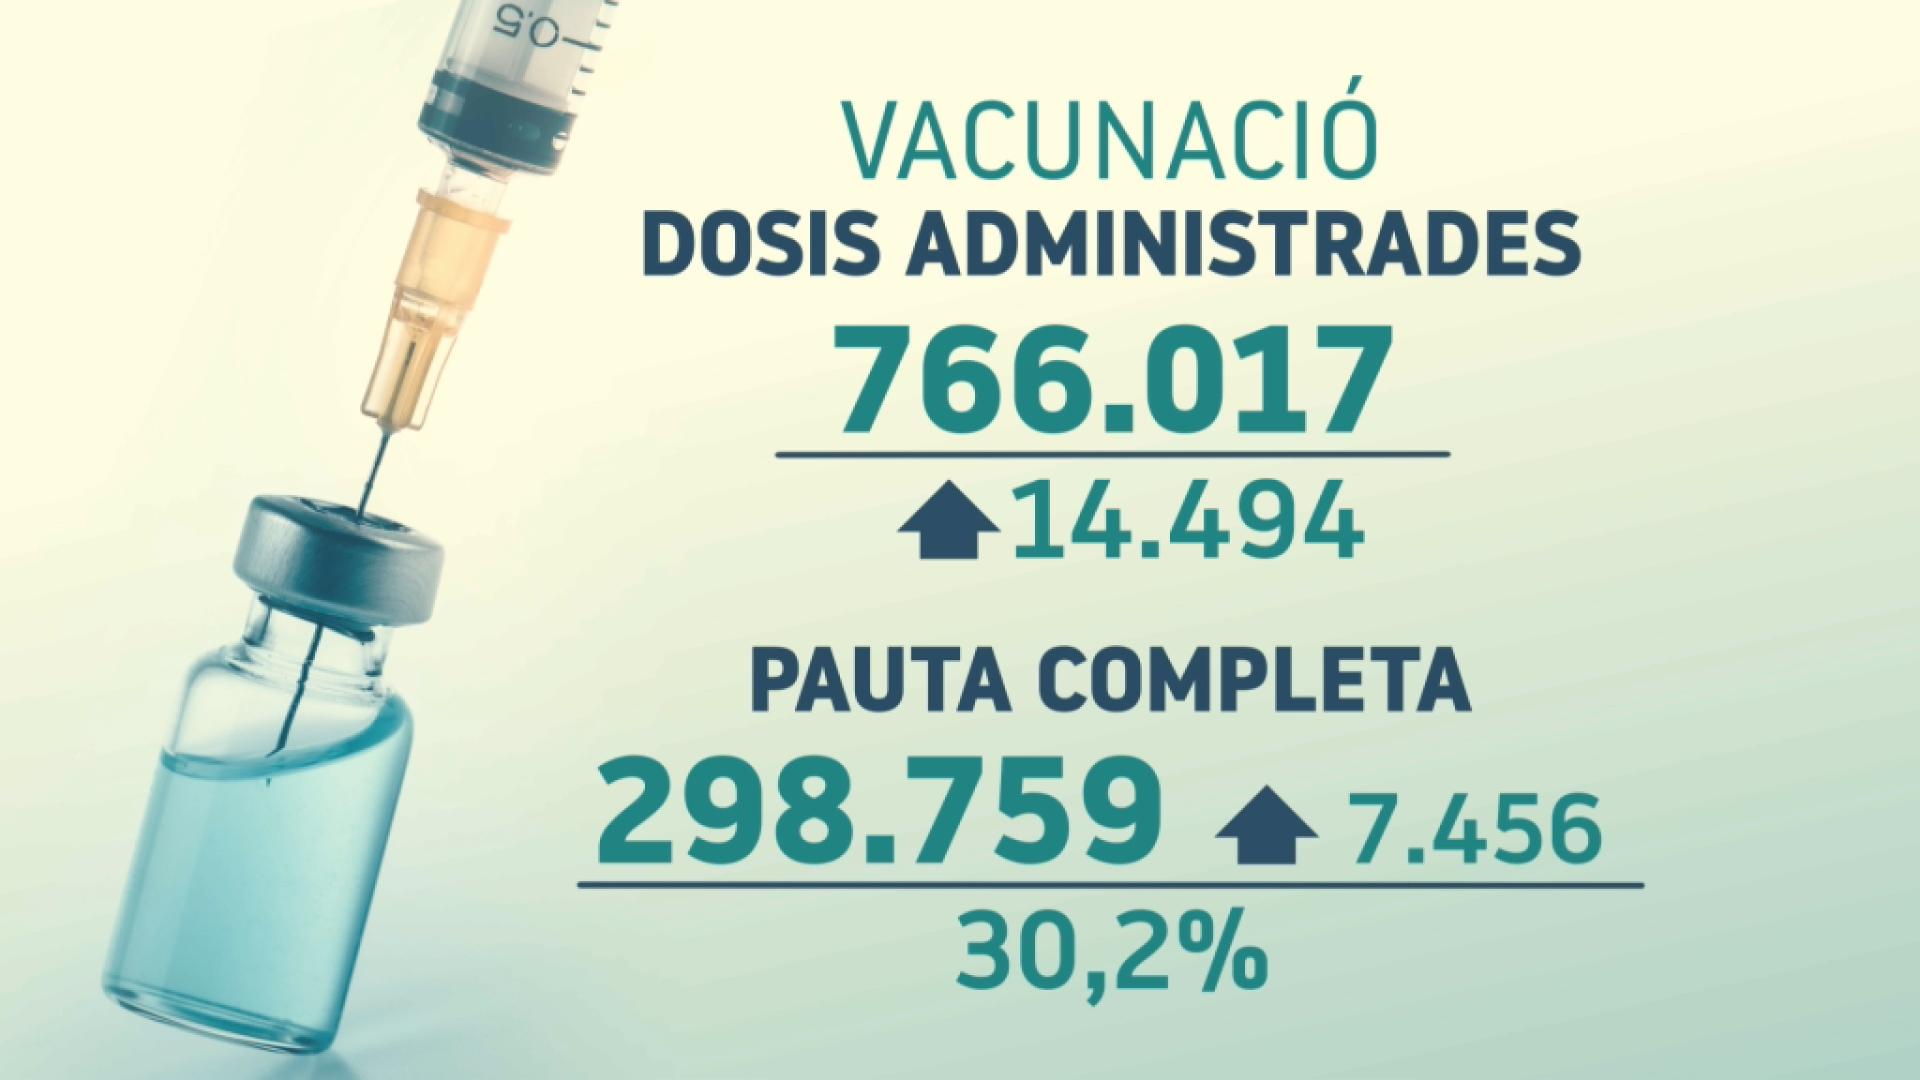 La+meitat+de+la+poblaci%C3%B3+diana+de+Balears+ja+est%C3%A0+vacunada+amb+almanco+una+dosi